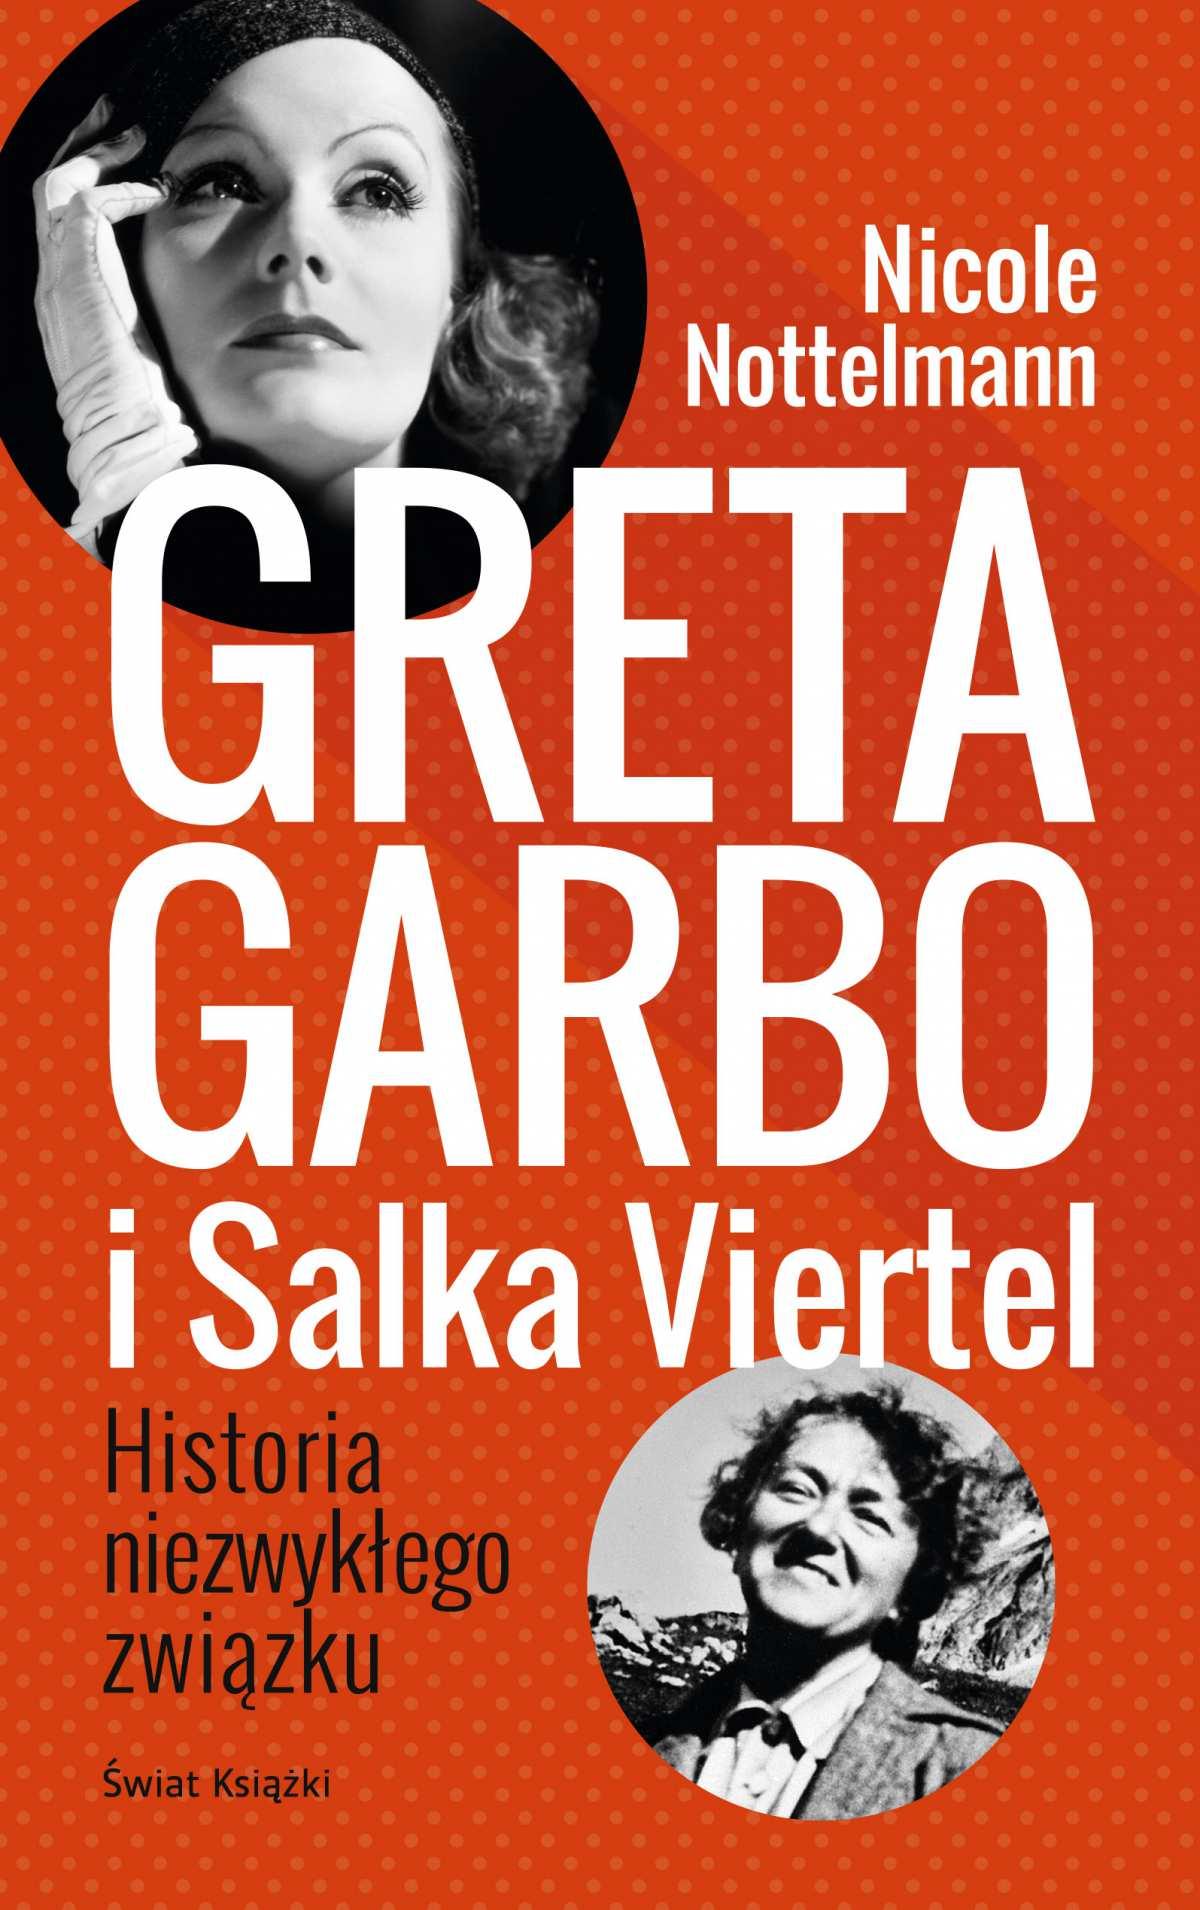 Greta Garbo i Salka Viertel - Ebook (Książka na Kindle) do pobrania w formacie MOBI